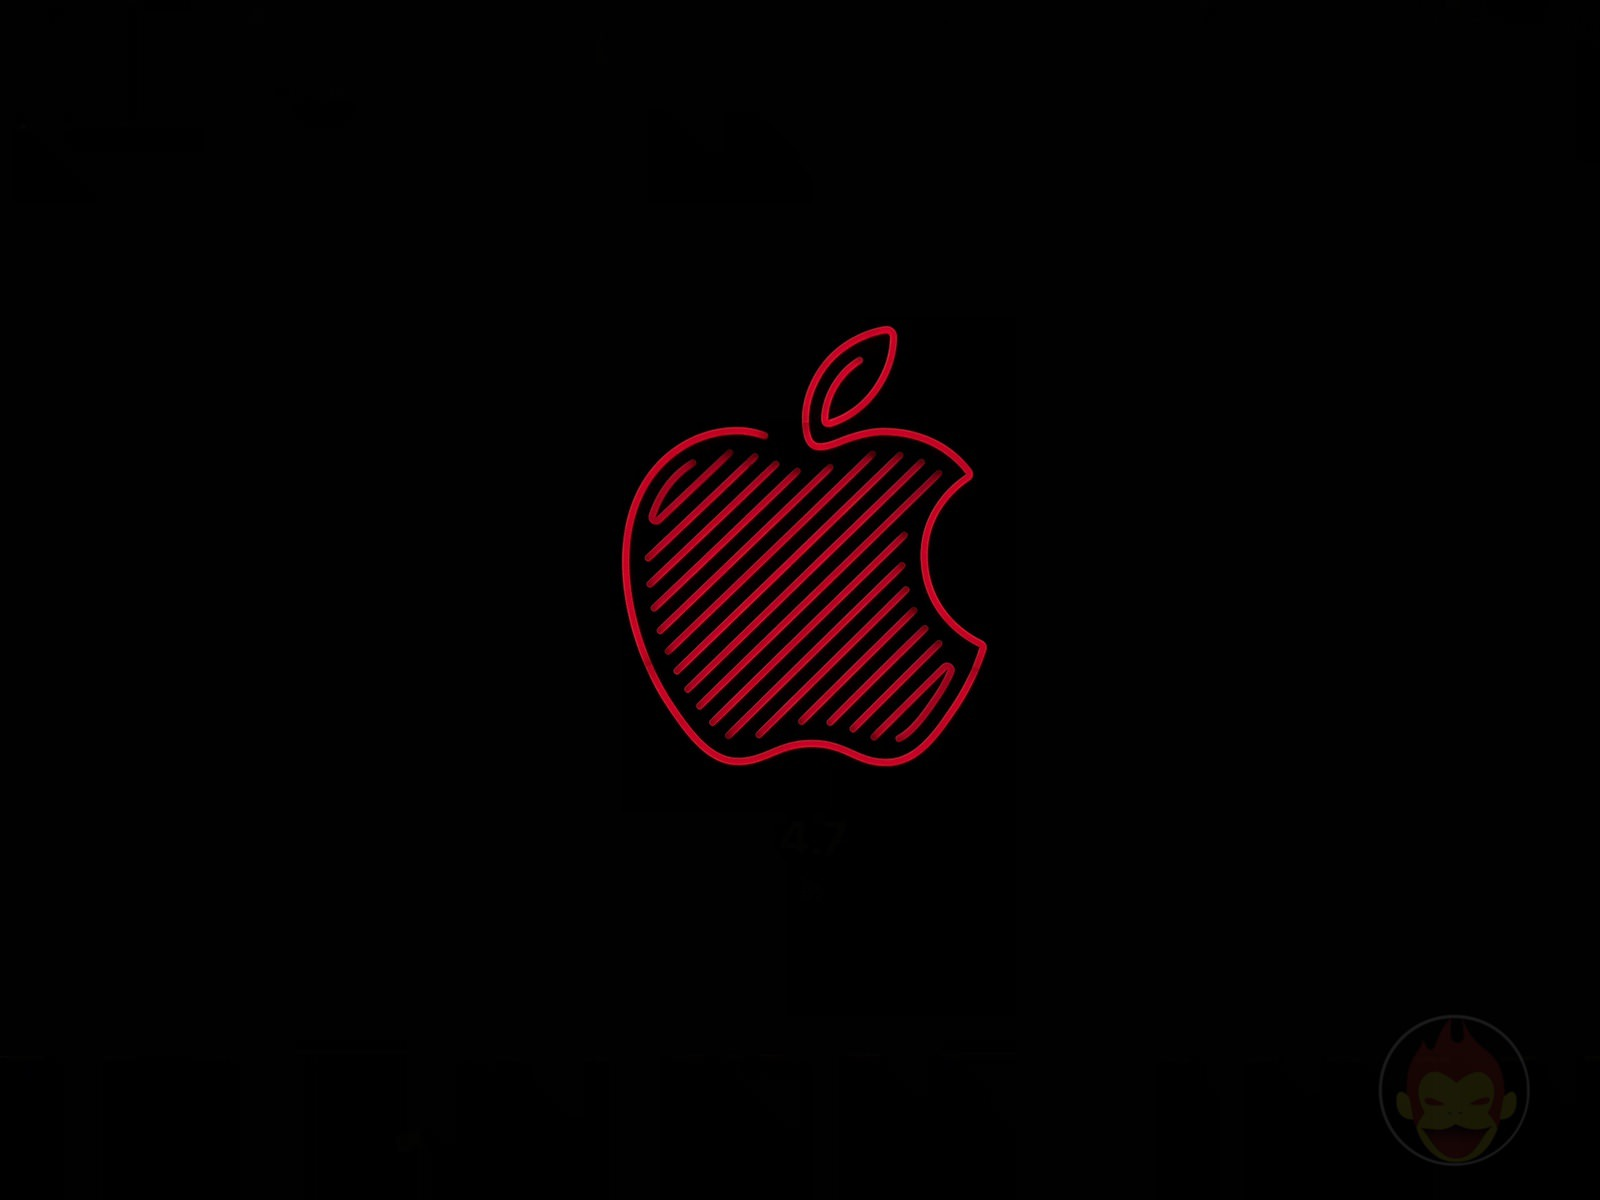 Apple-Shinjuku-After-Dark-25.jpg